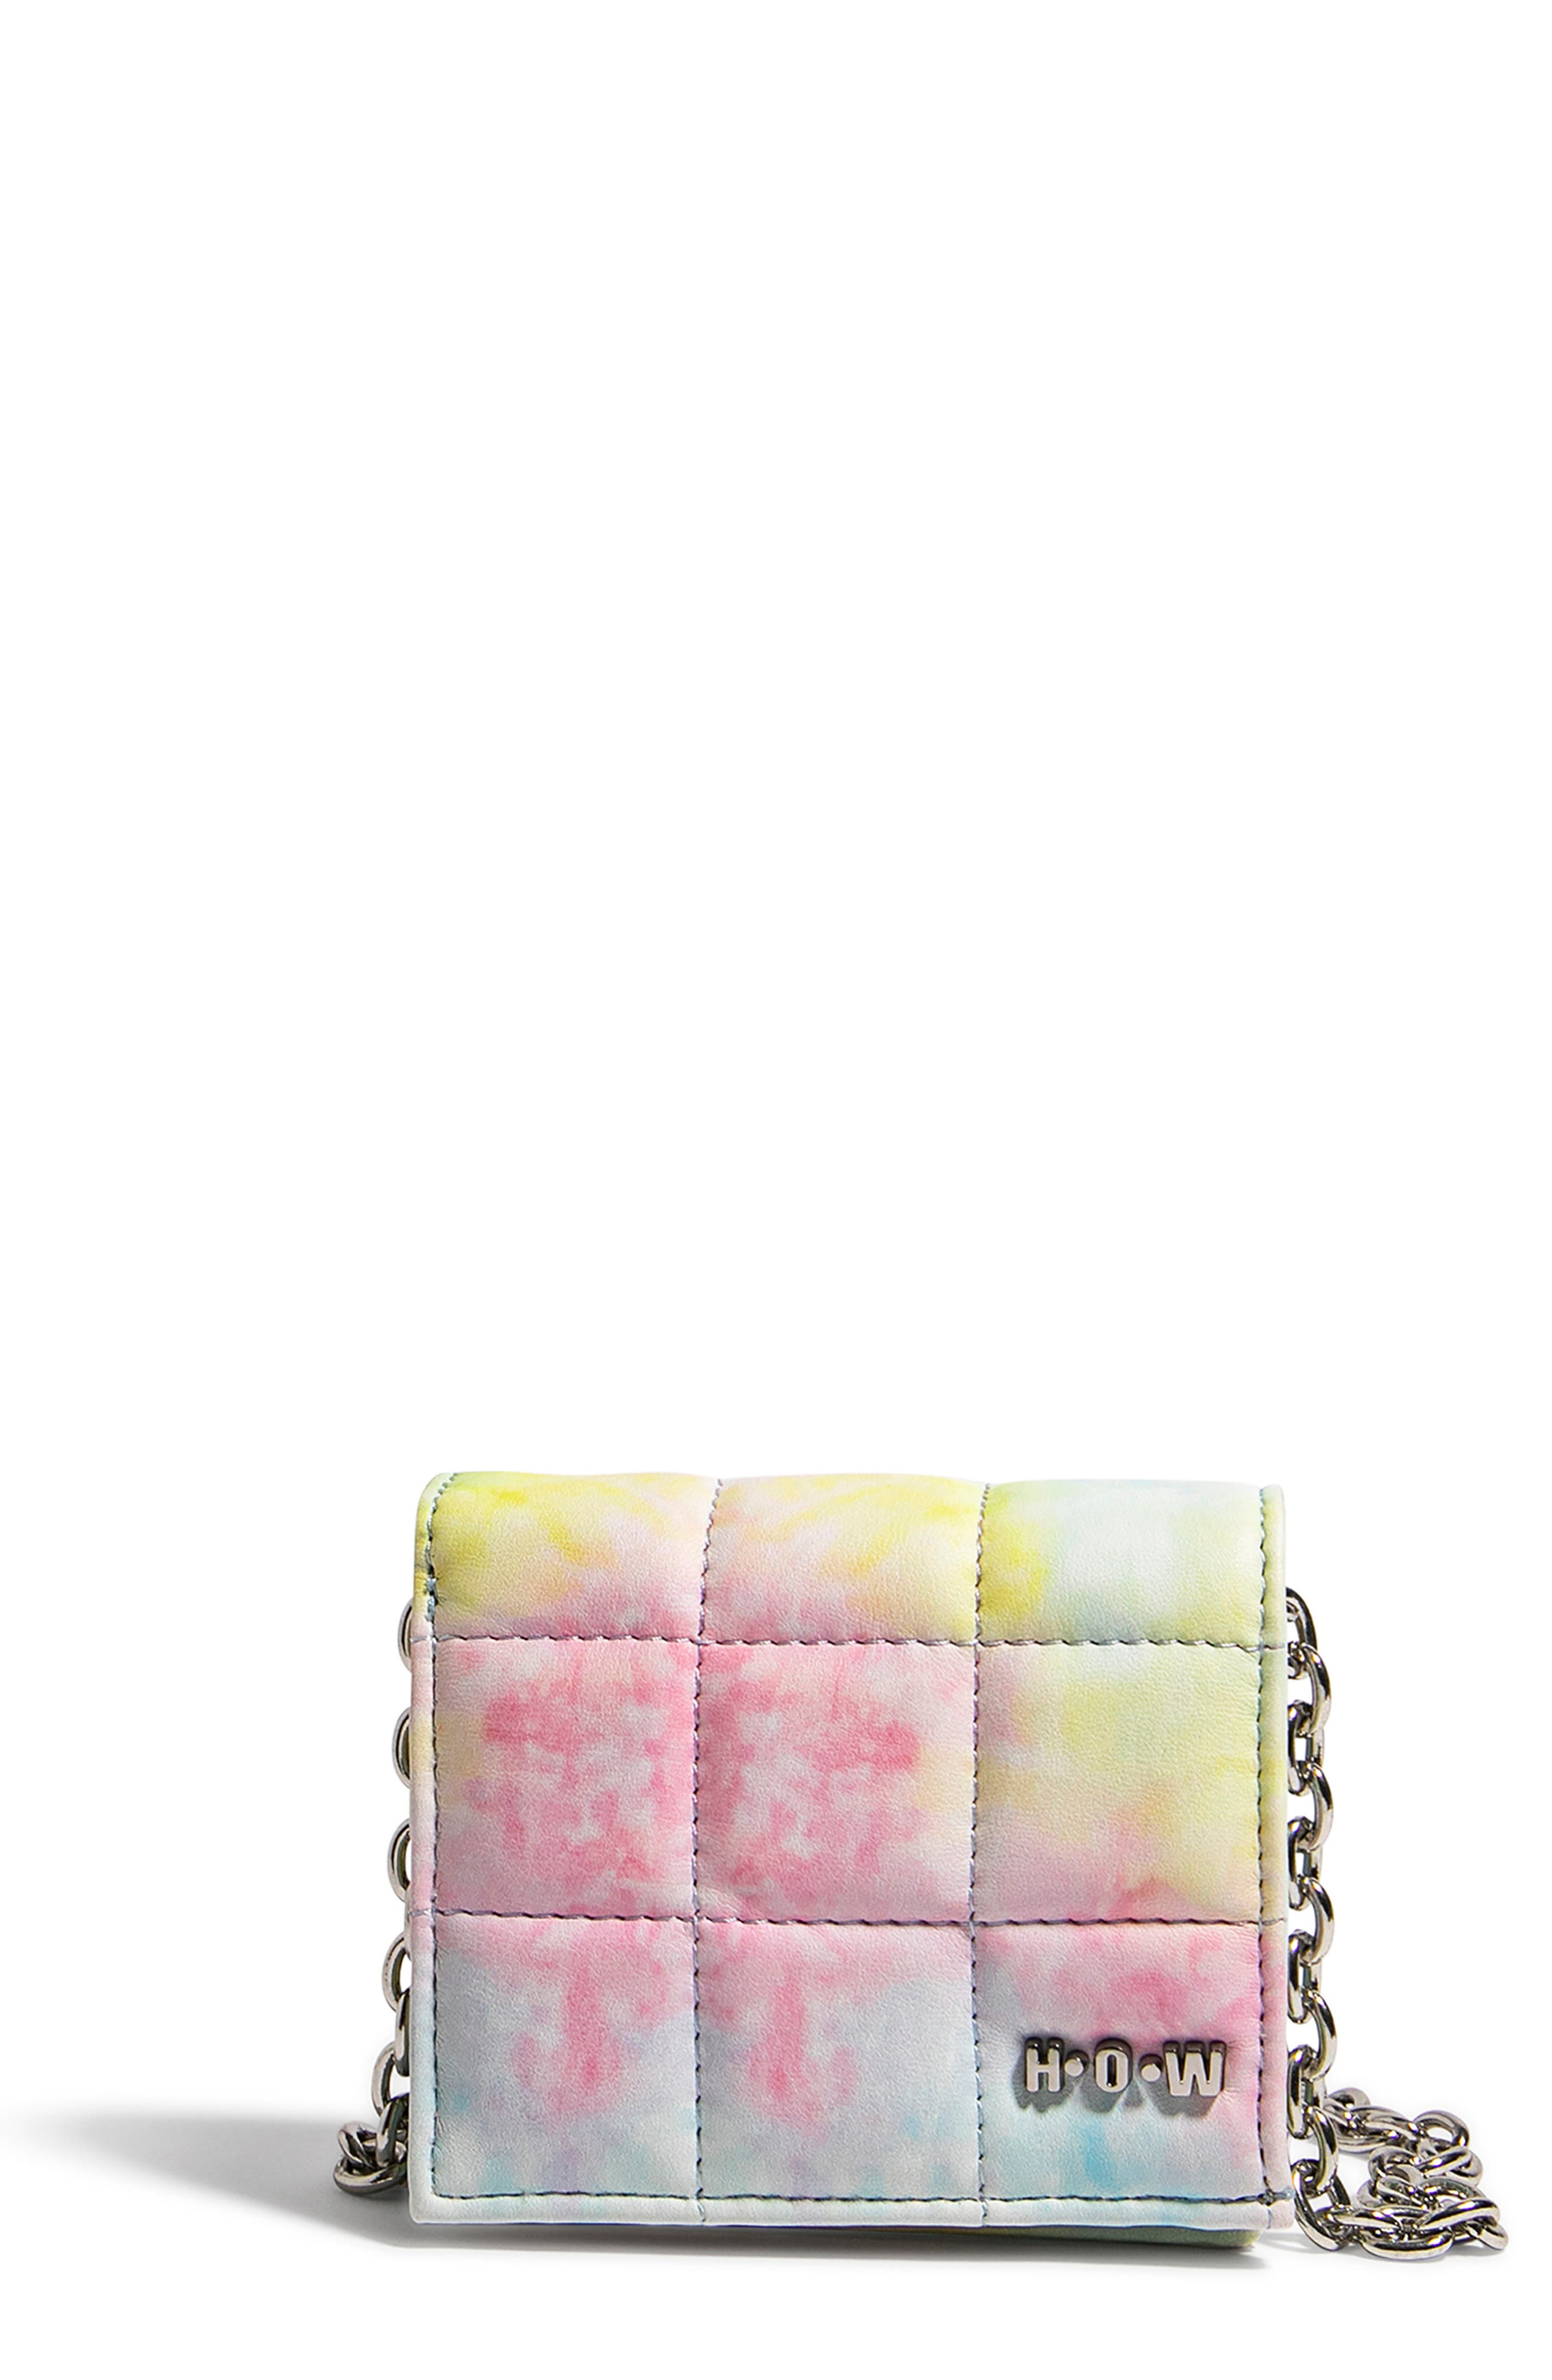 H.o.w. We Shop Vegan Leather Wallet Crossbody Bag